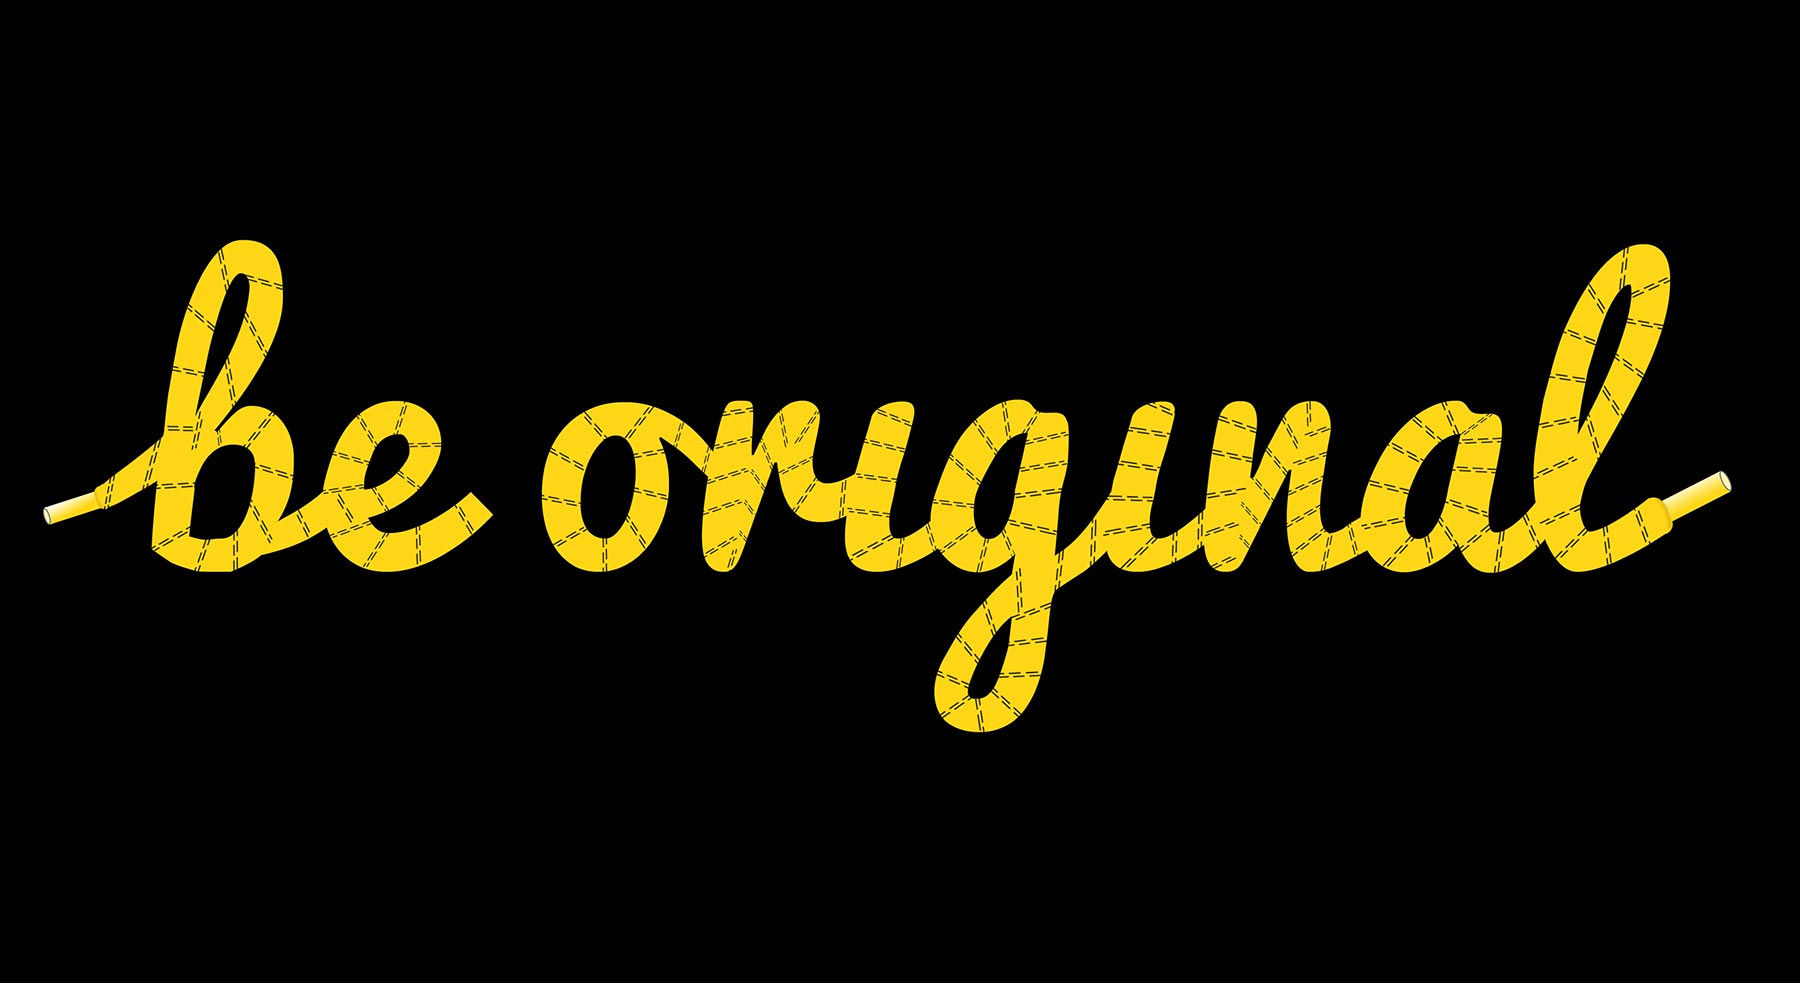 be-original-tshirt-callout